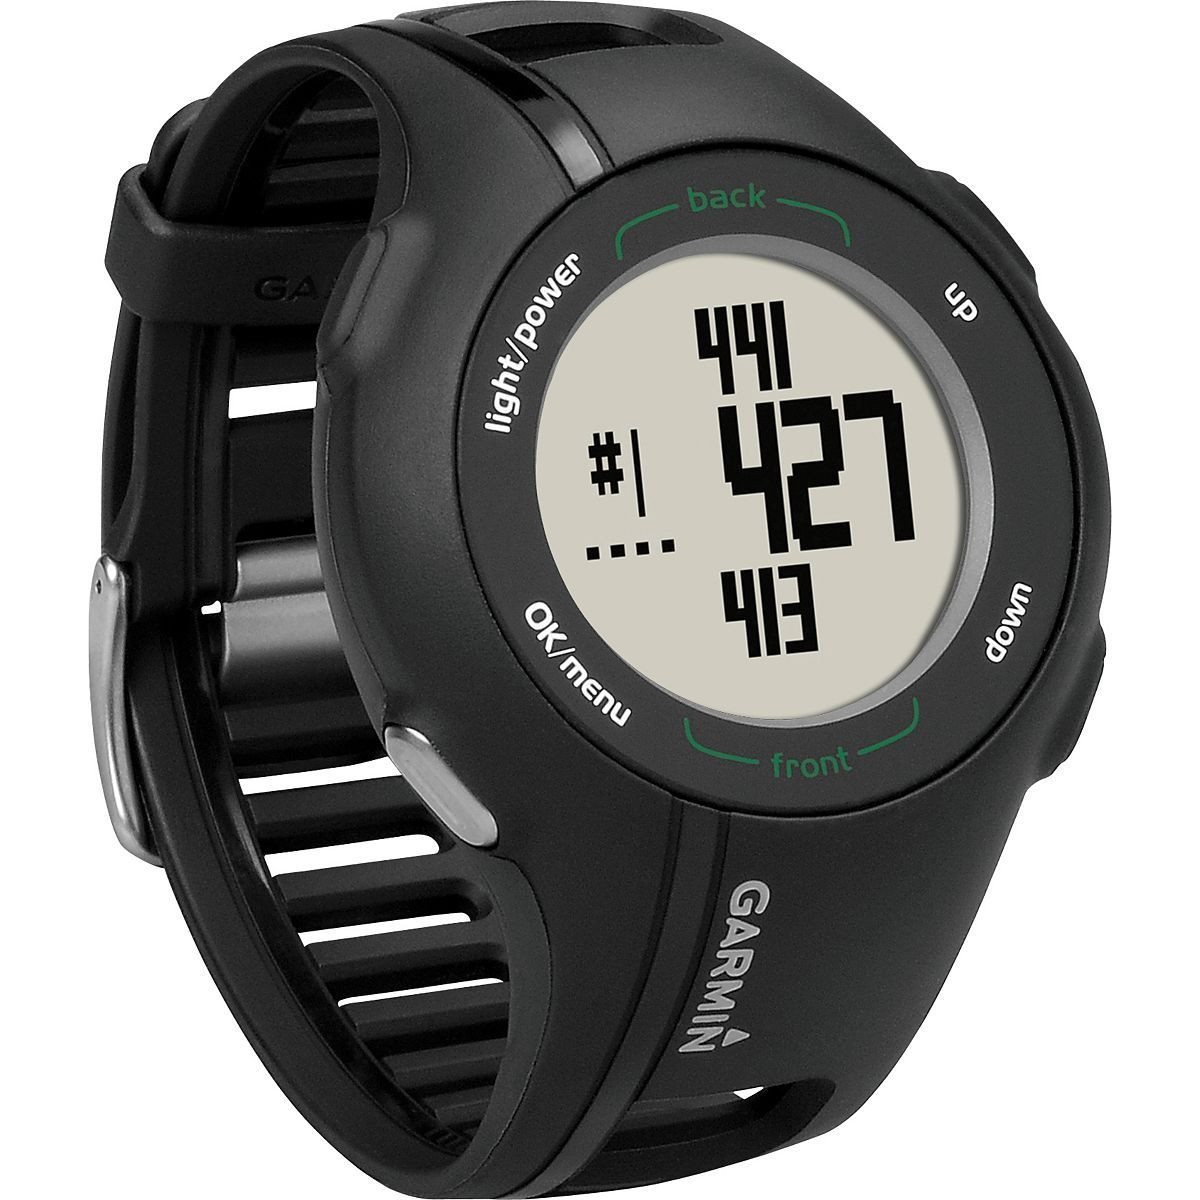 Garmin Approach S1 GPS Watch at Paul